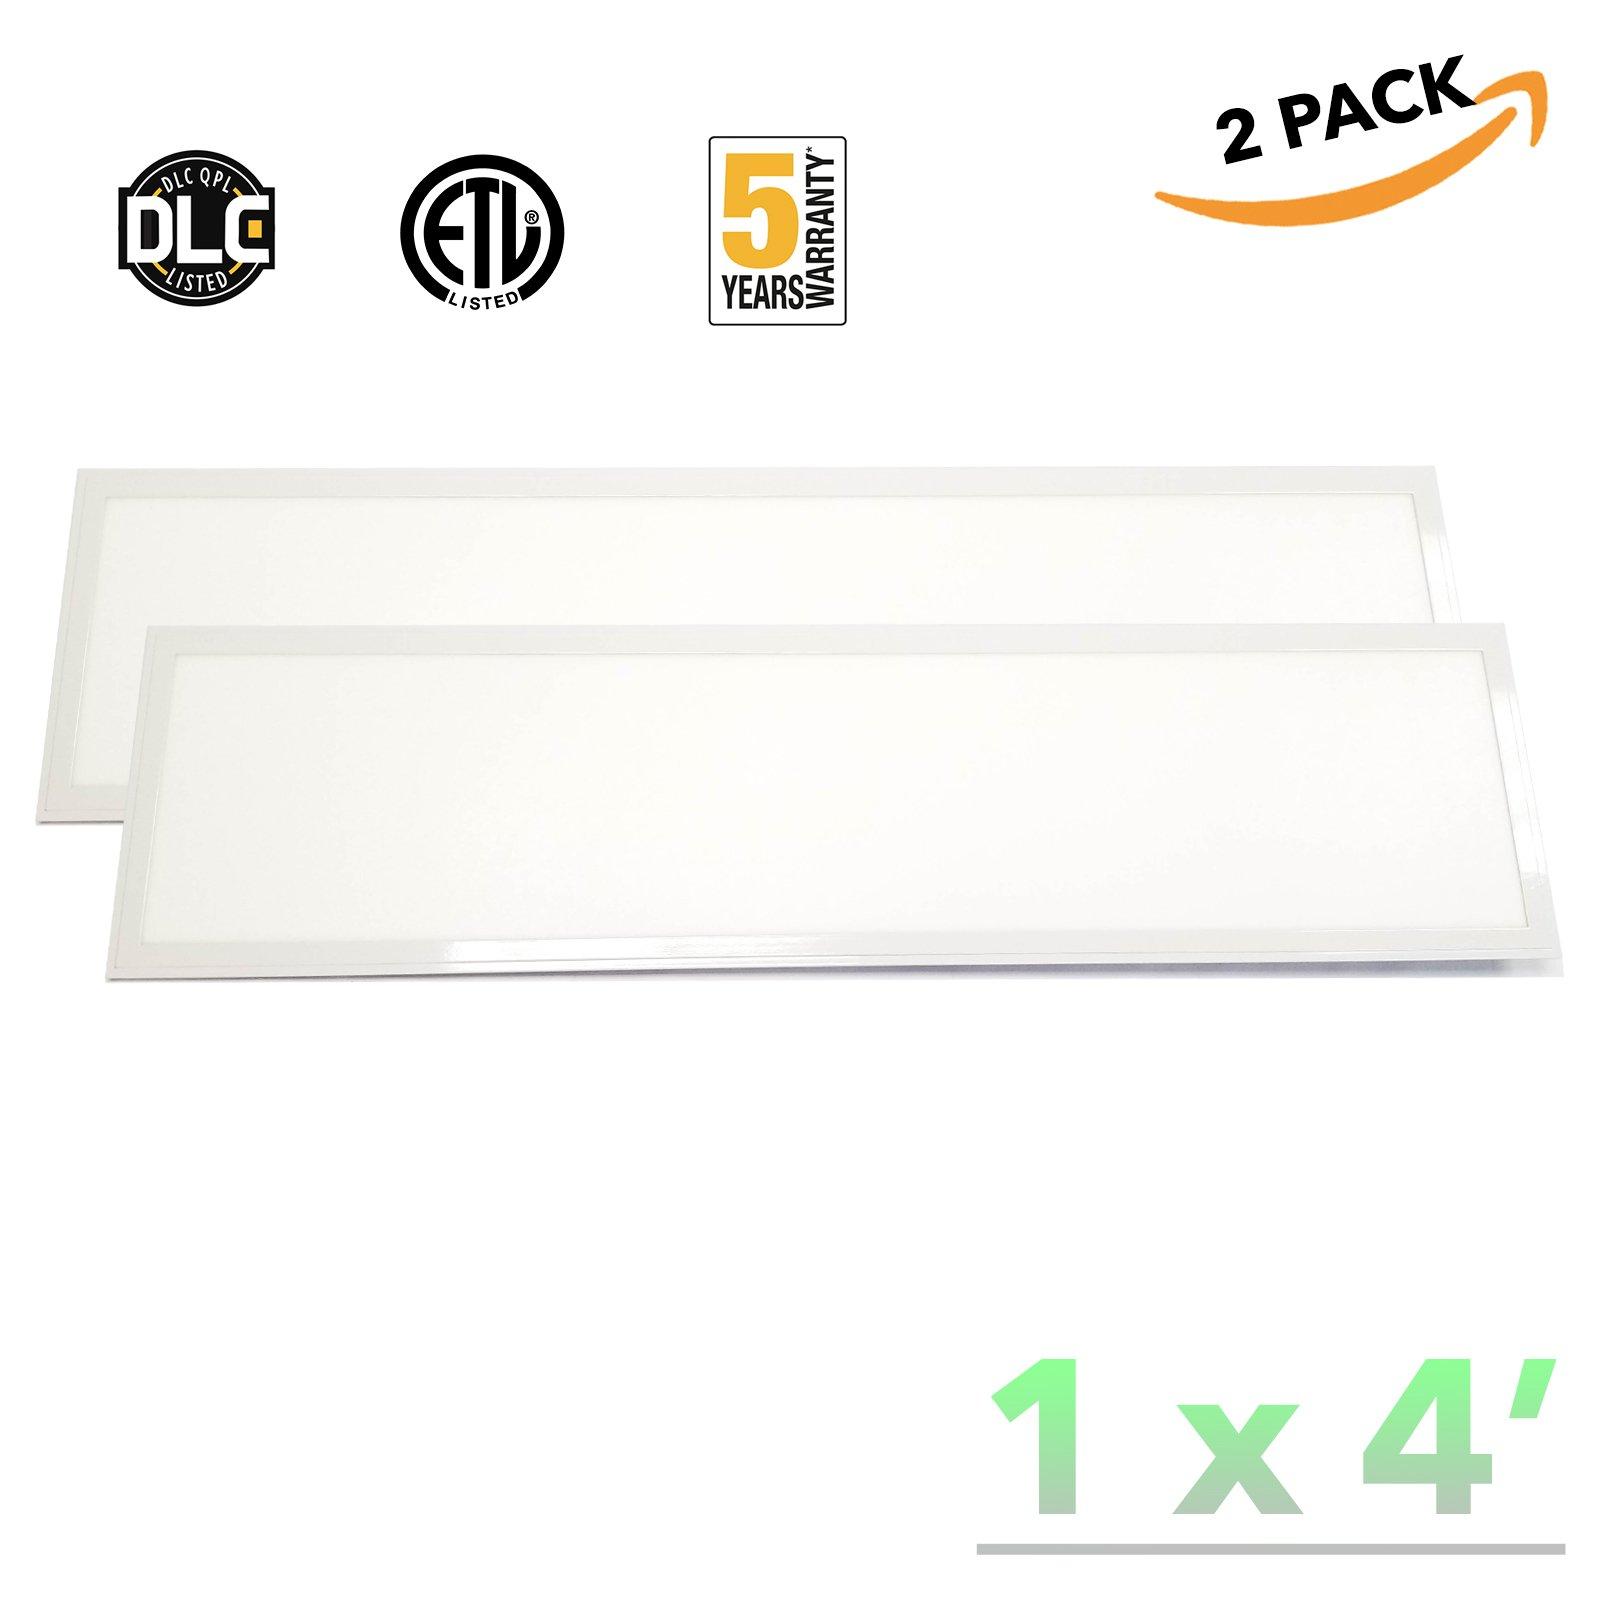 American Greenpower USA LED 1x4 LED Flat Panel Light Troffer, 36W 5000K, Dimmable, 4550 lumens, 125lm/w, DLC Premium 4.3, (2-PACK)